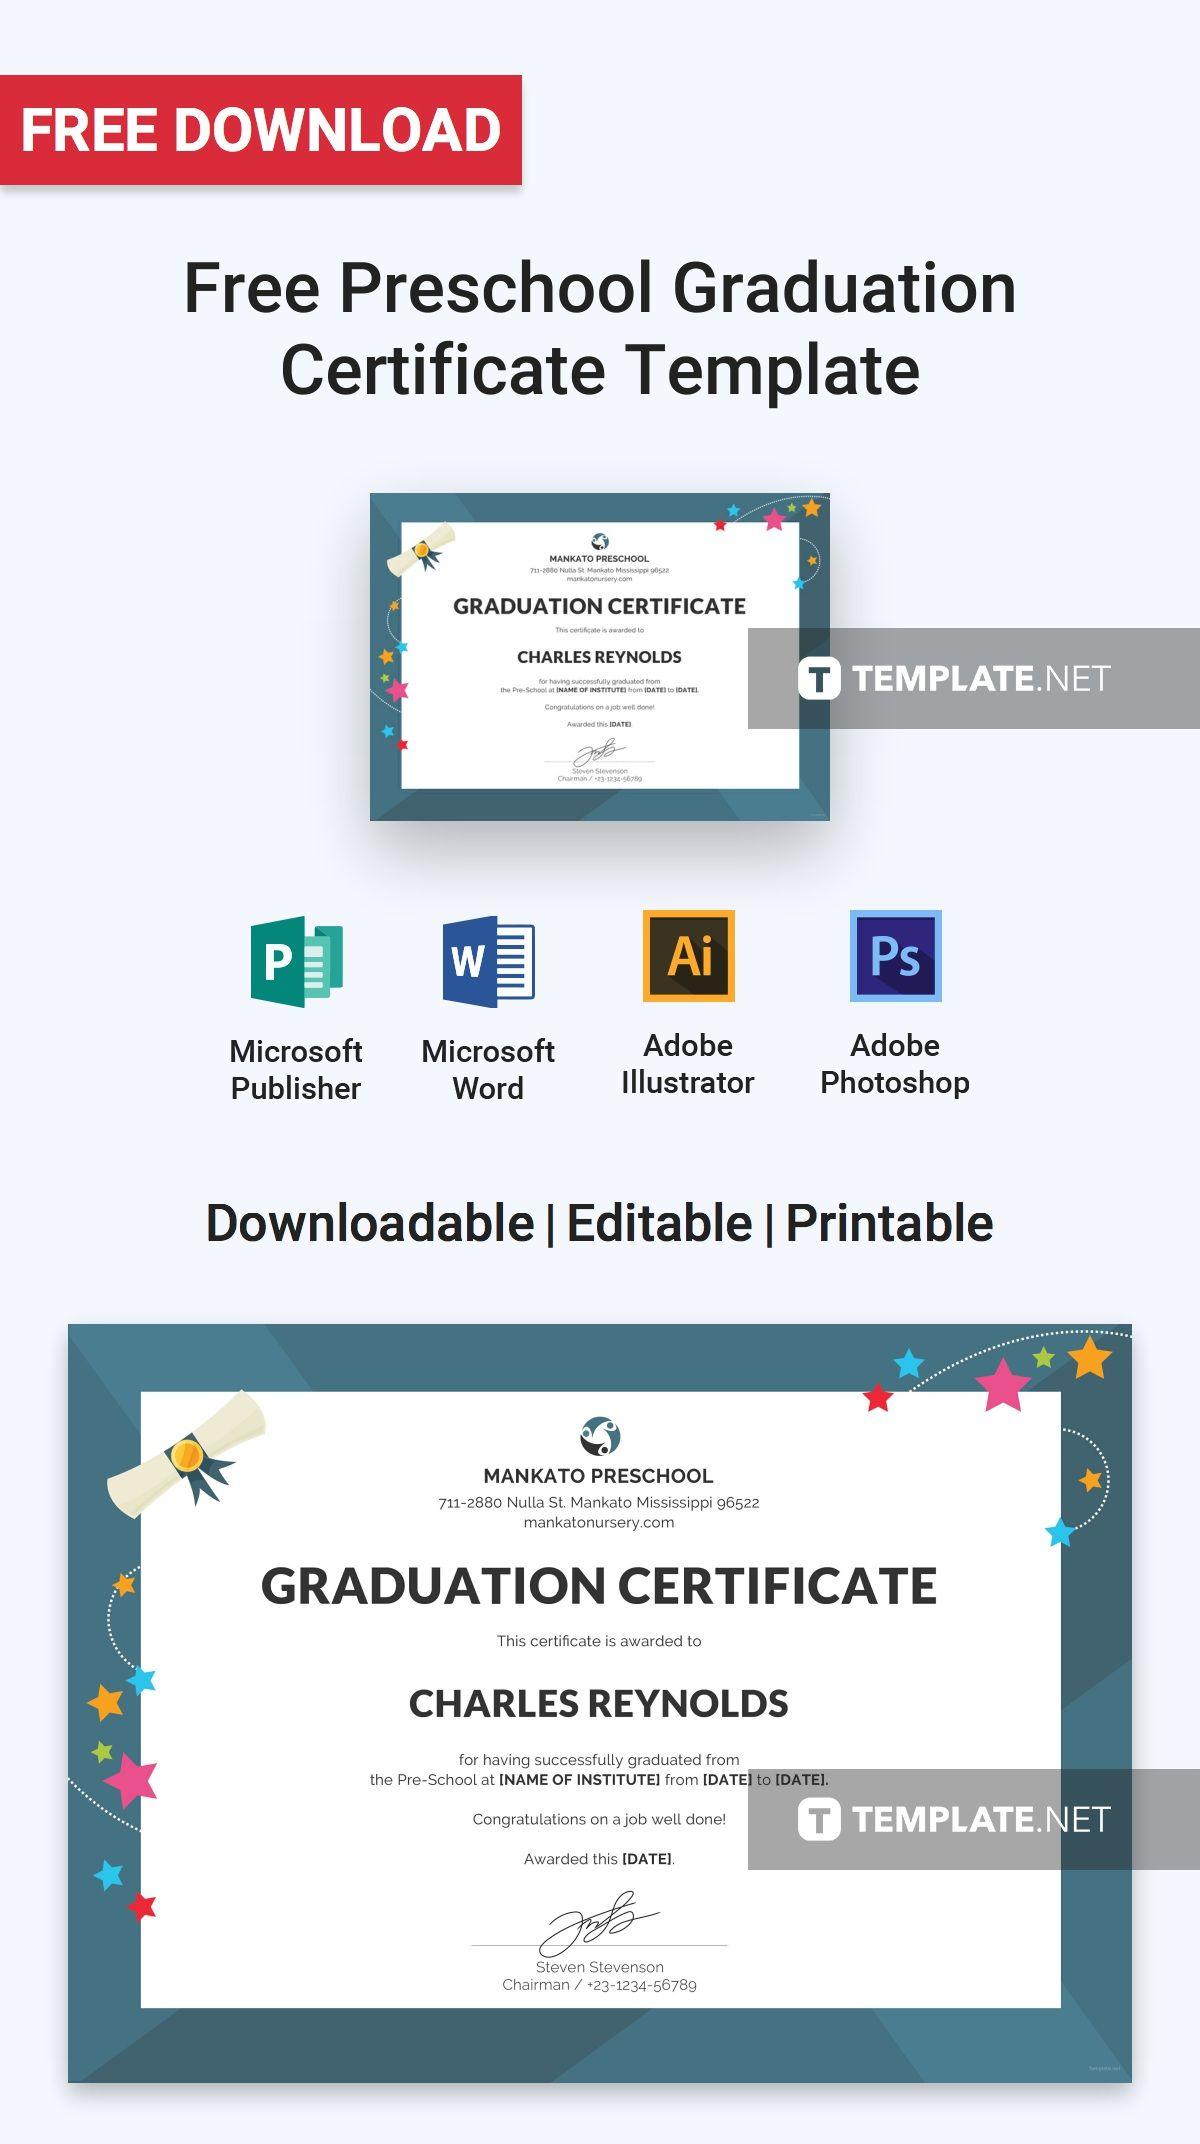 Free Preschool Graduation Certificate